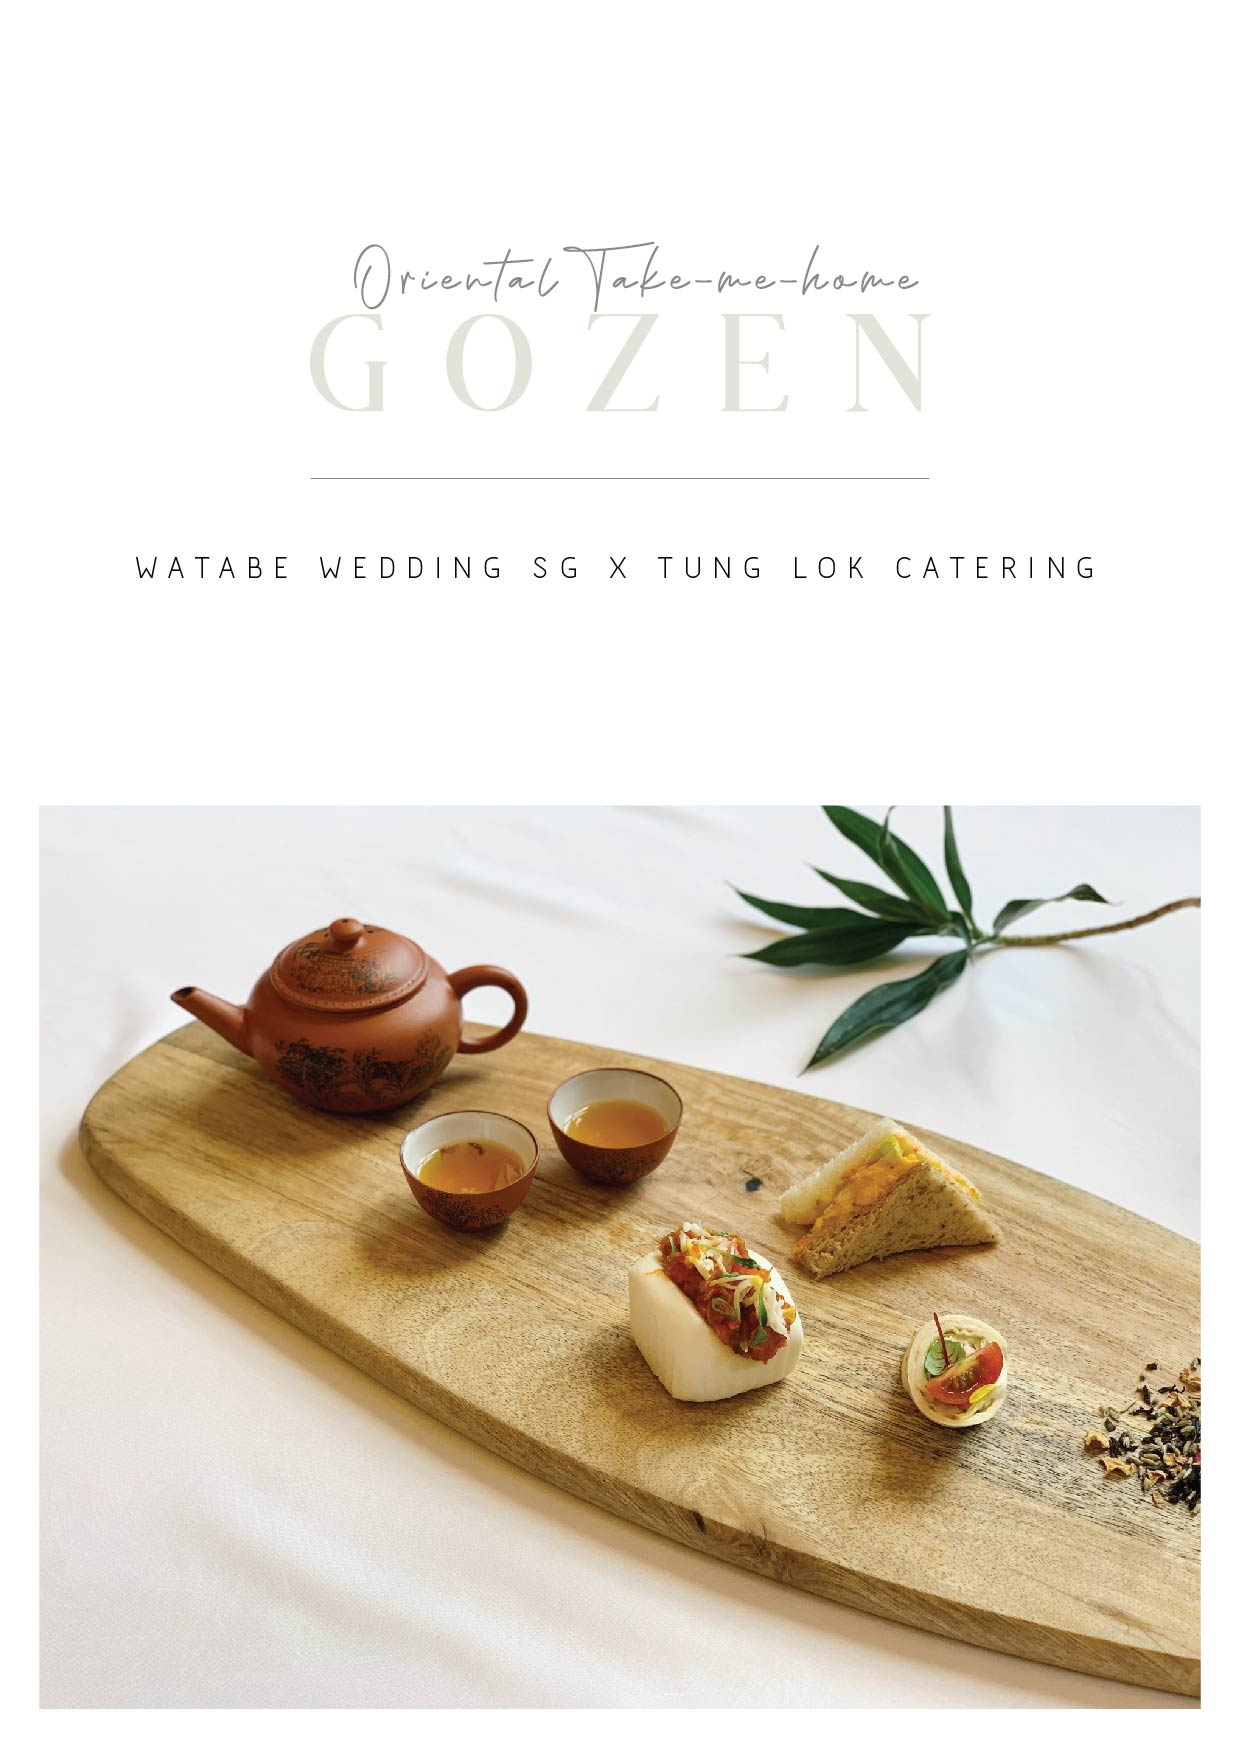 [210715] Dim Sum Loong Take-me-home Gozen -01